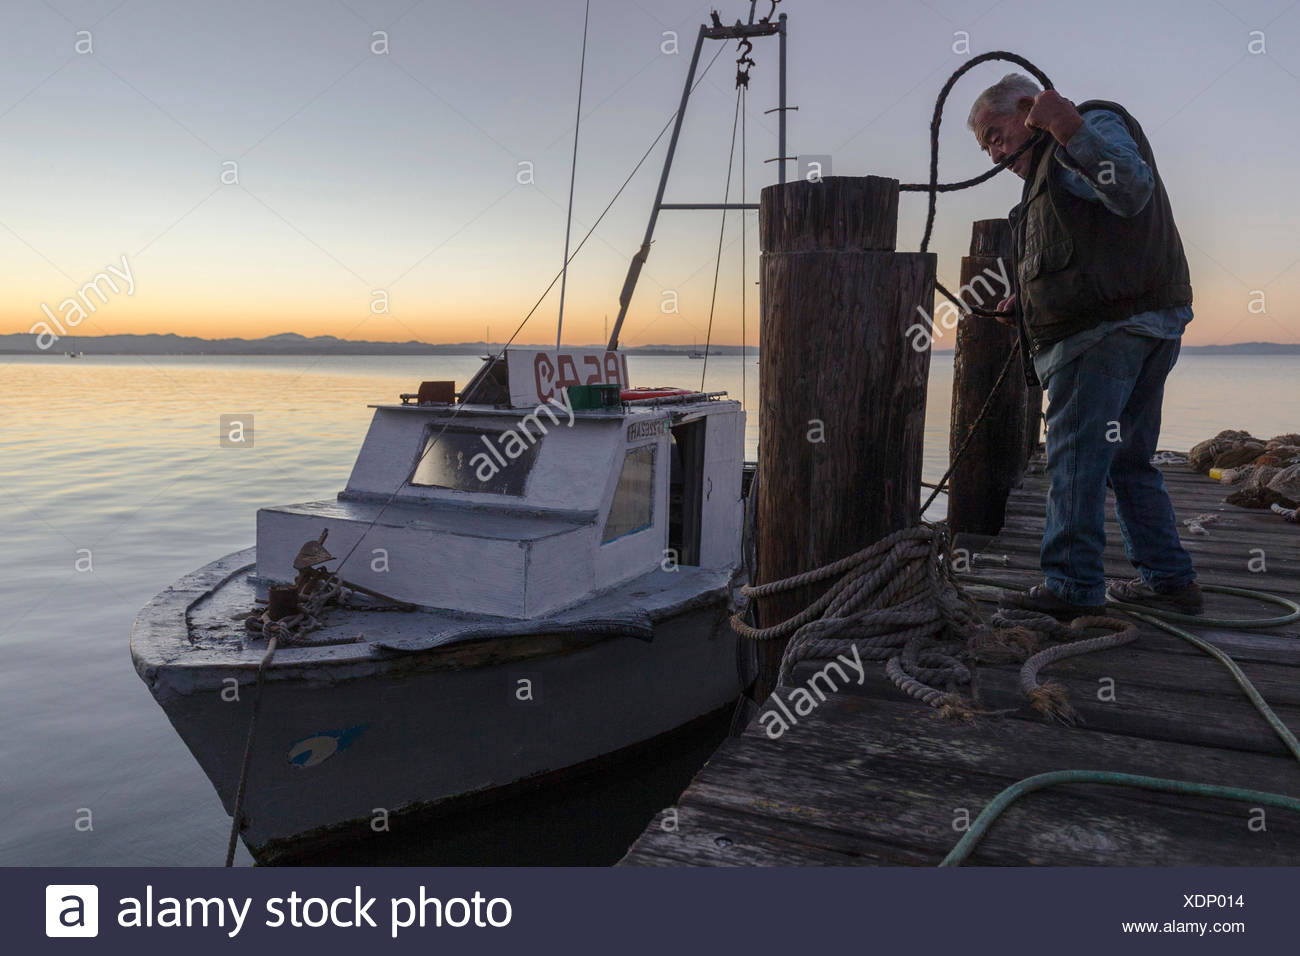 shrimp fisherman standing on pier near boat at sunset,China Camp,California,USA - Stock Image